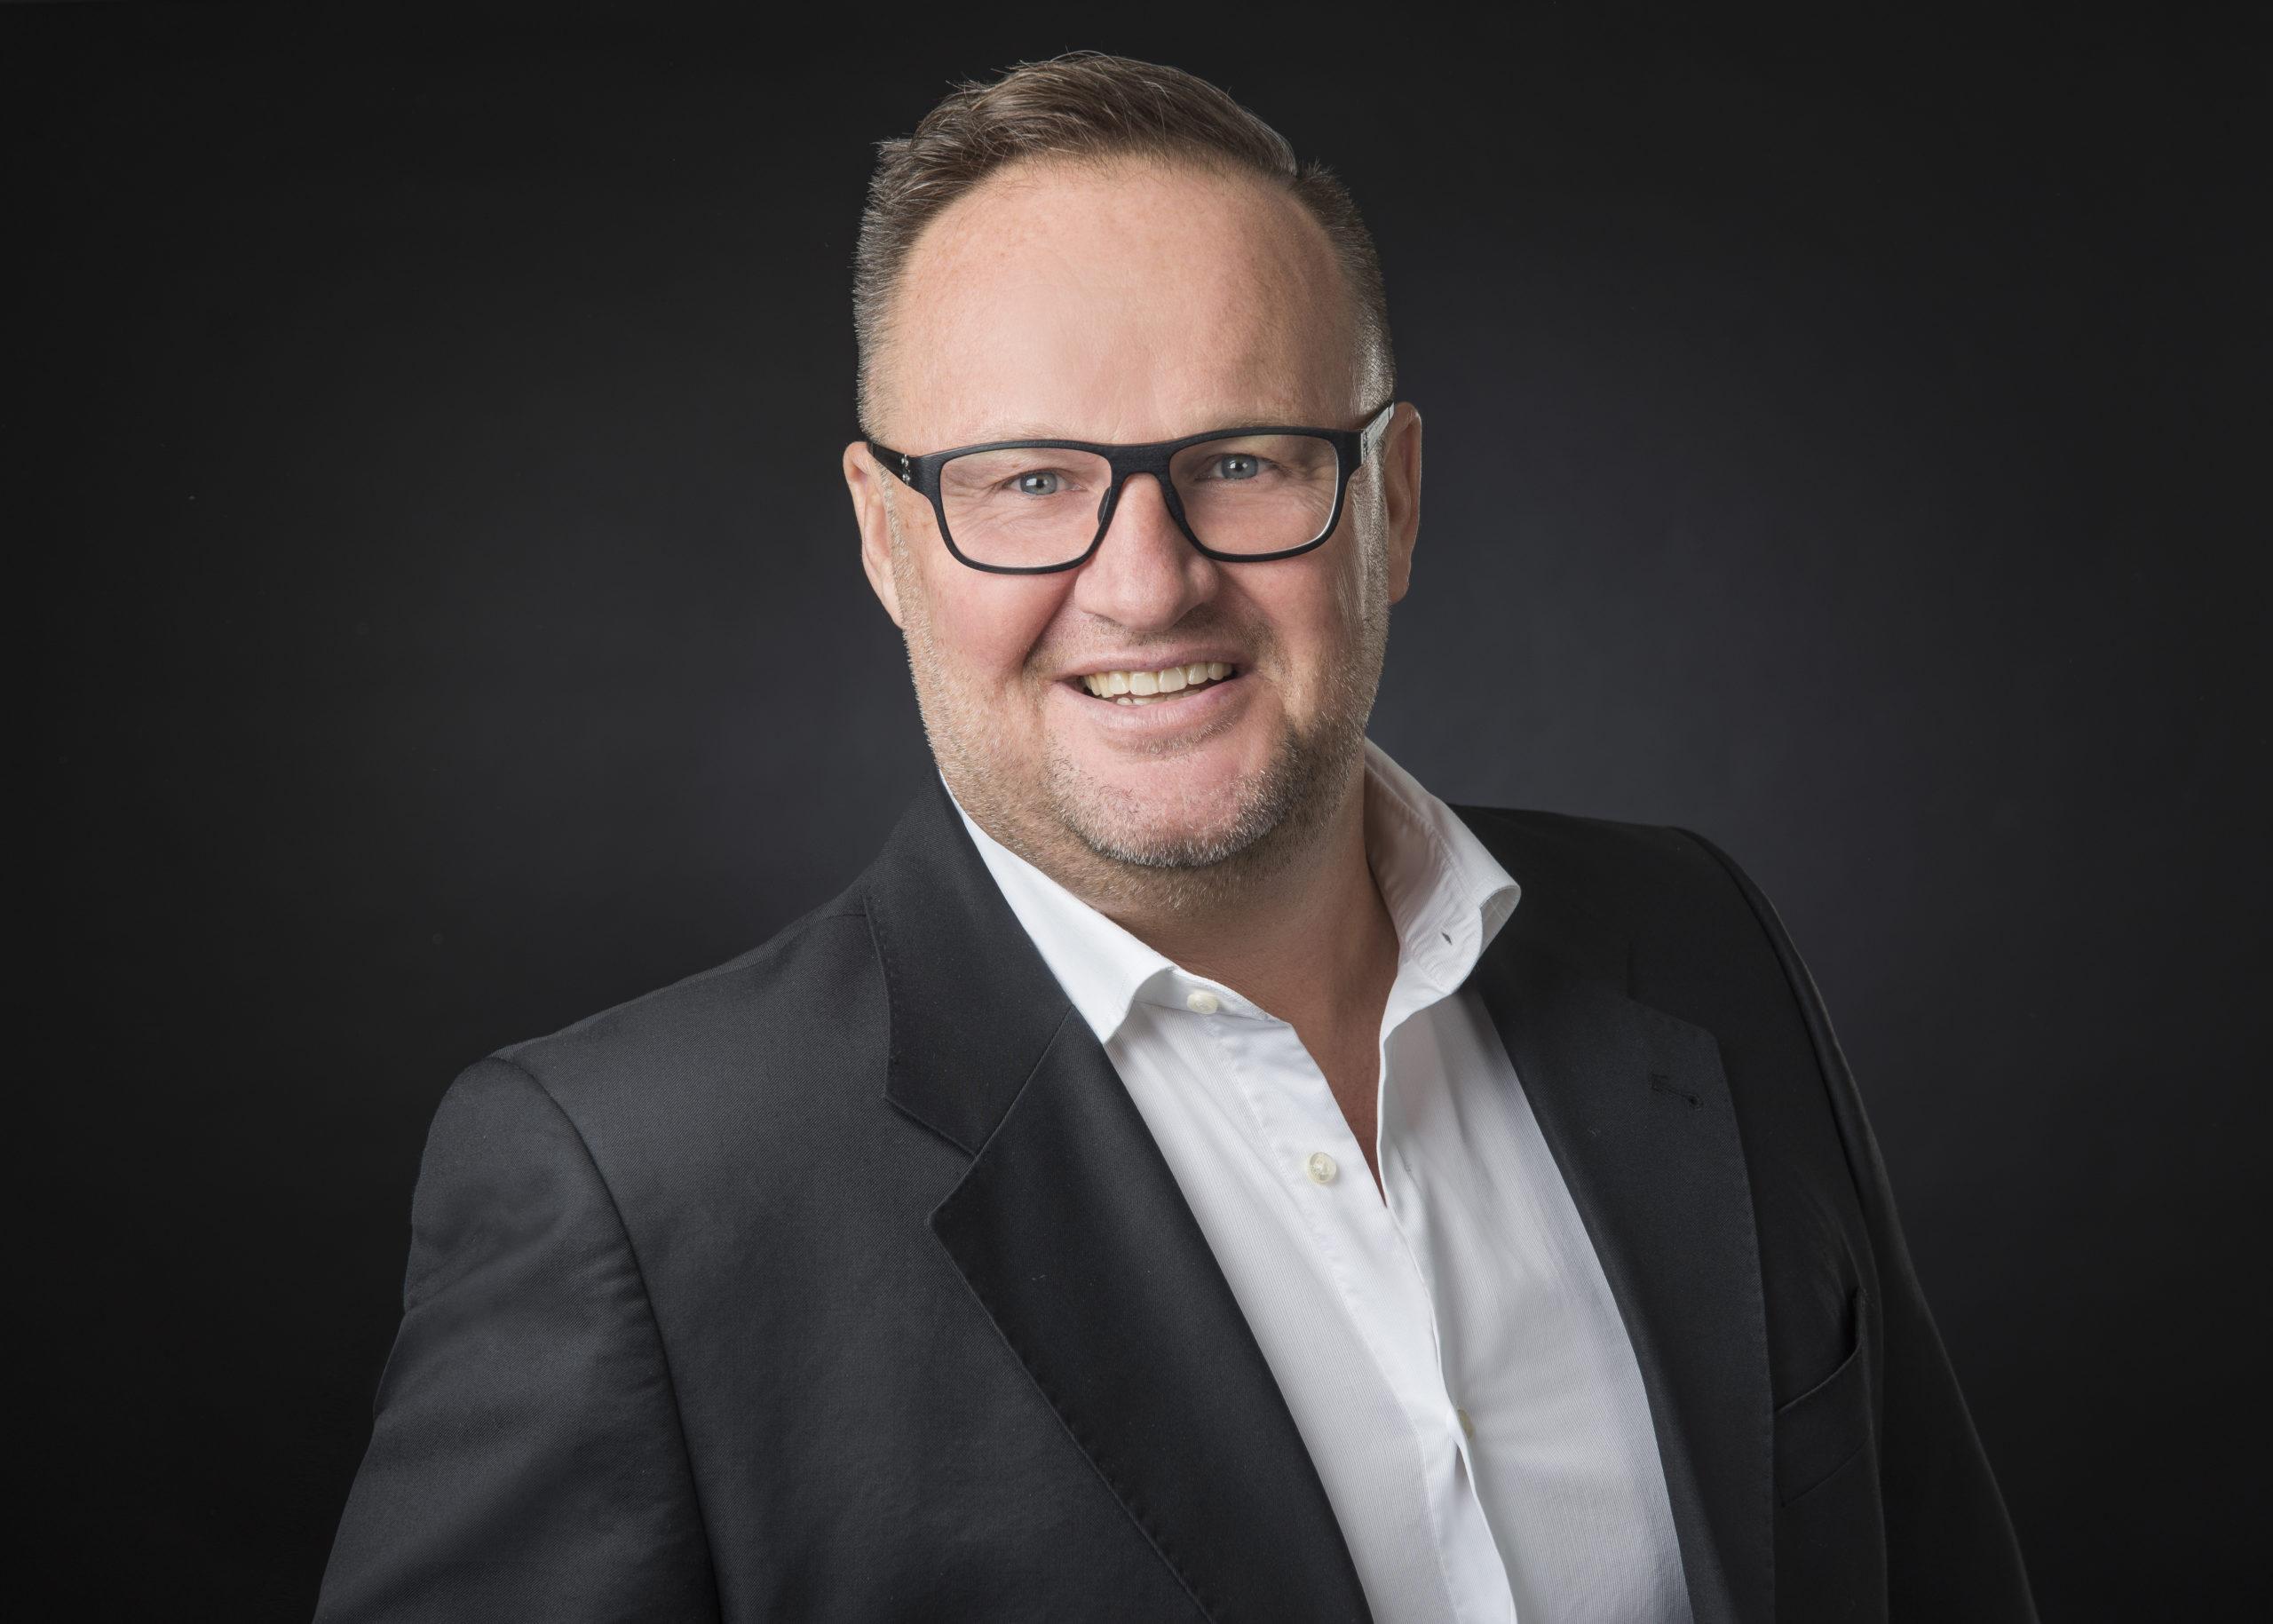 Managing Partner Michael Grubbert